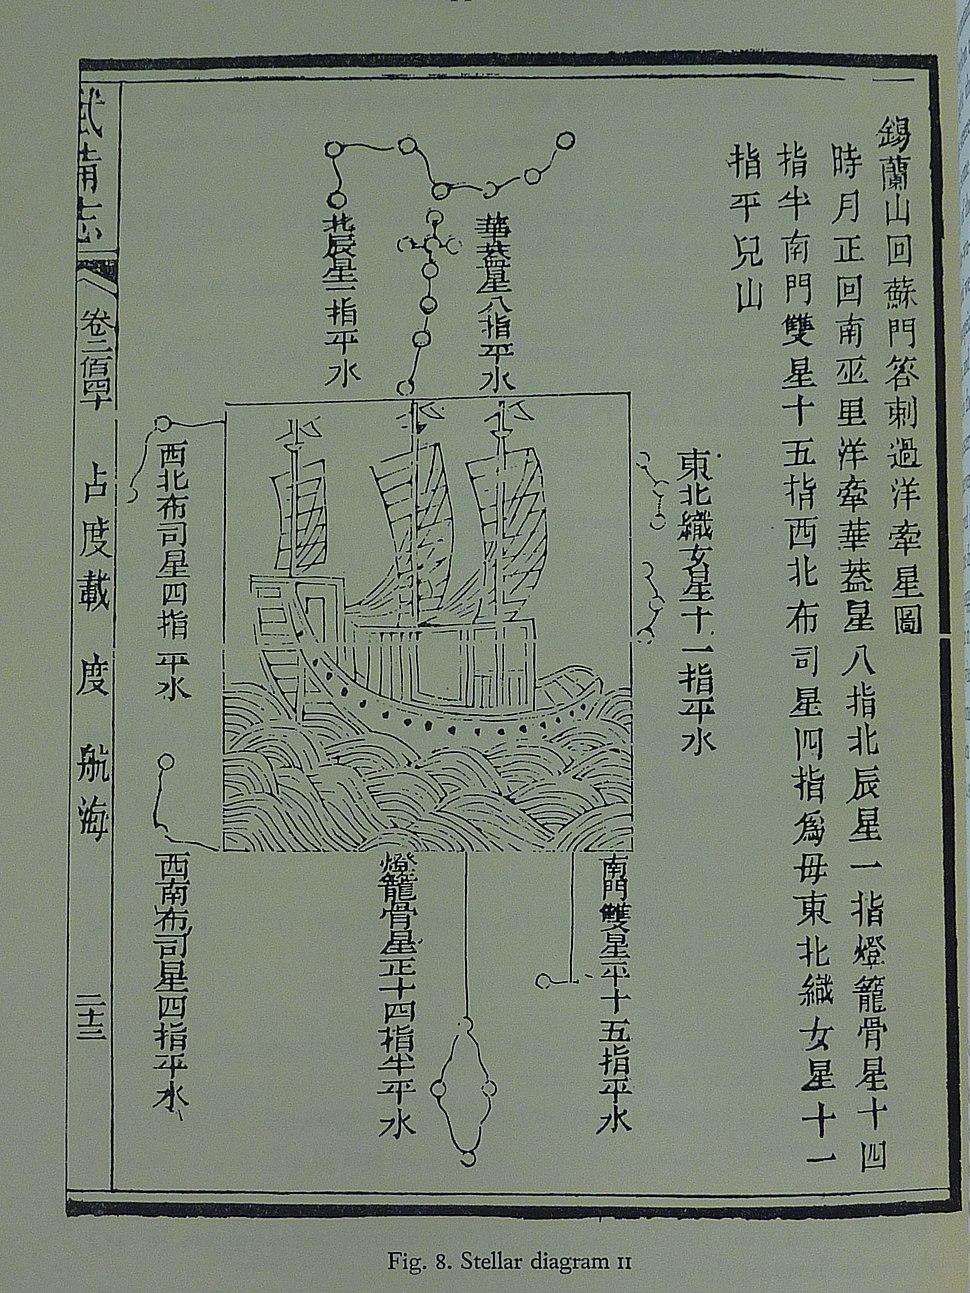 Mao Kun Map - stellar diagram 2 - P1100090